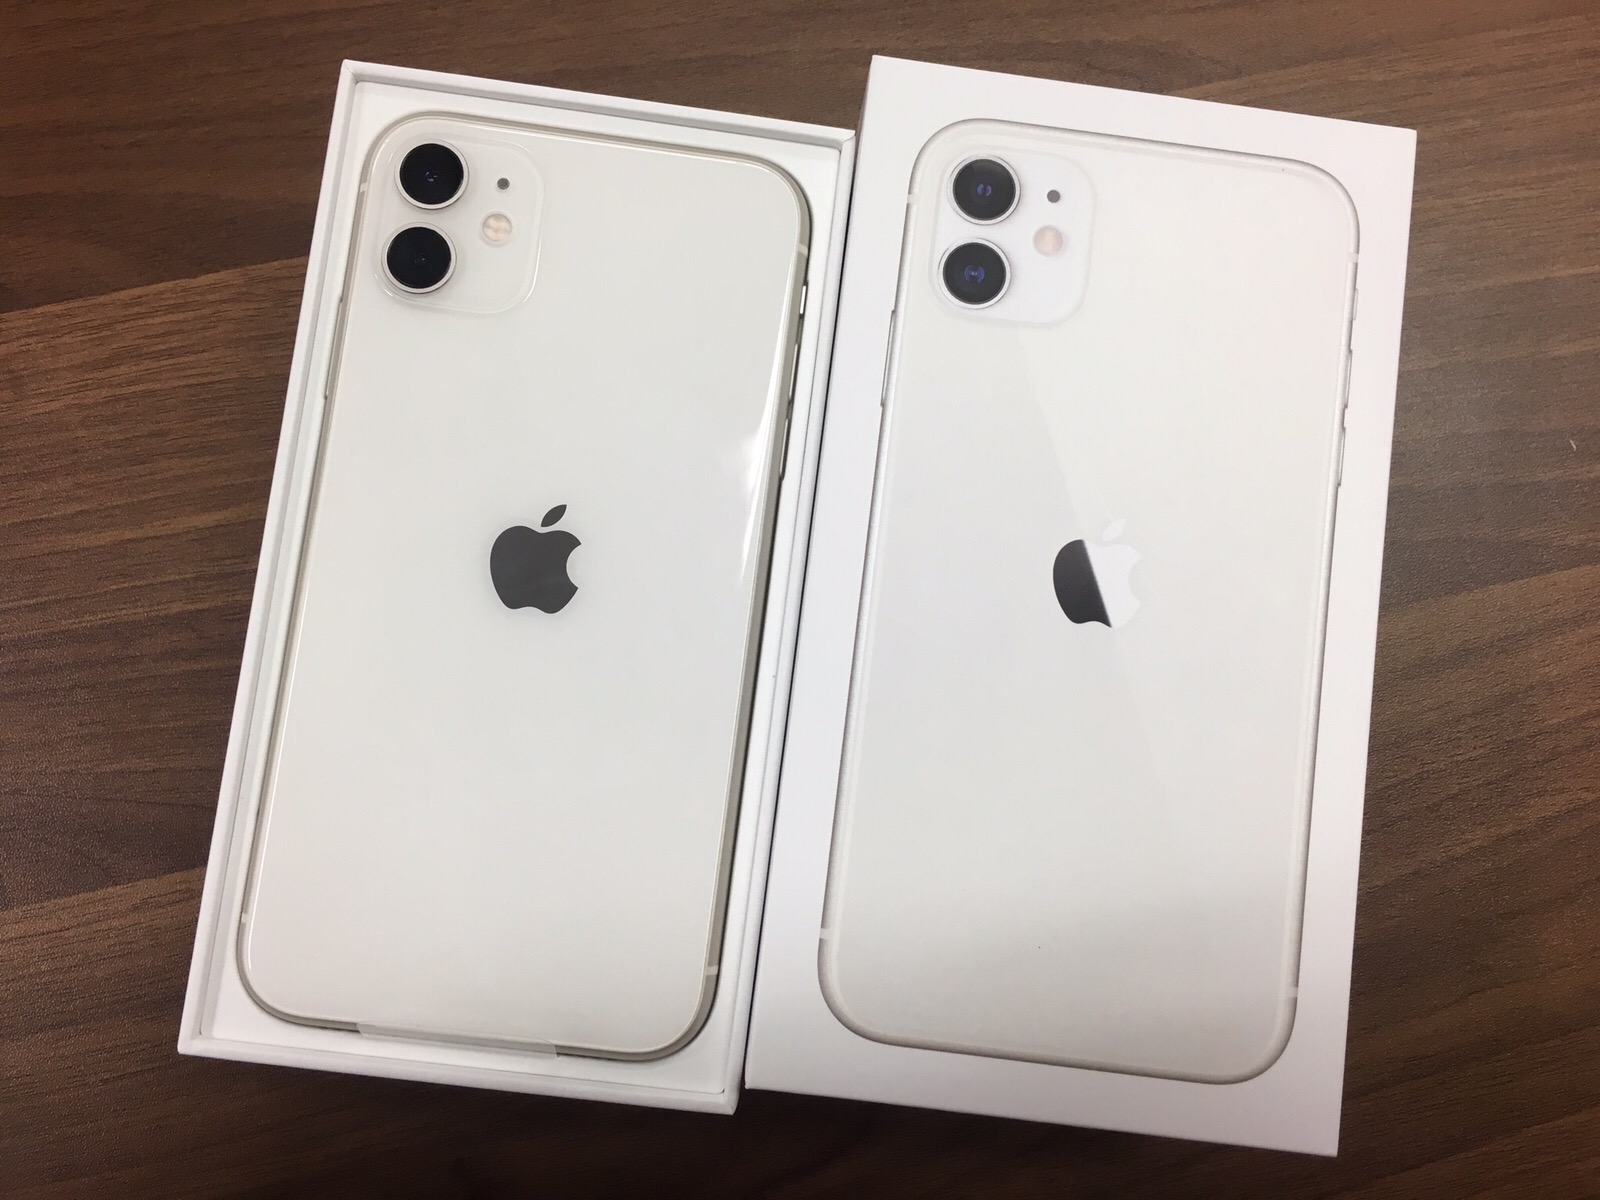 iPhone11,iPhone11Pro,iPhone11ProMAXなどの新機種も!残債ありでも高価買取!当日全額お渡しできます!